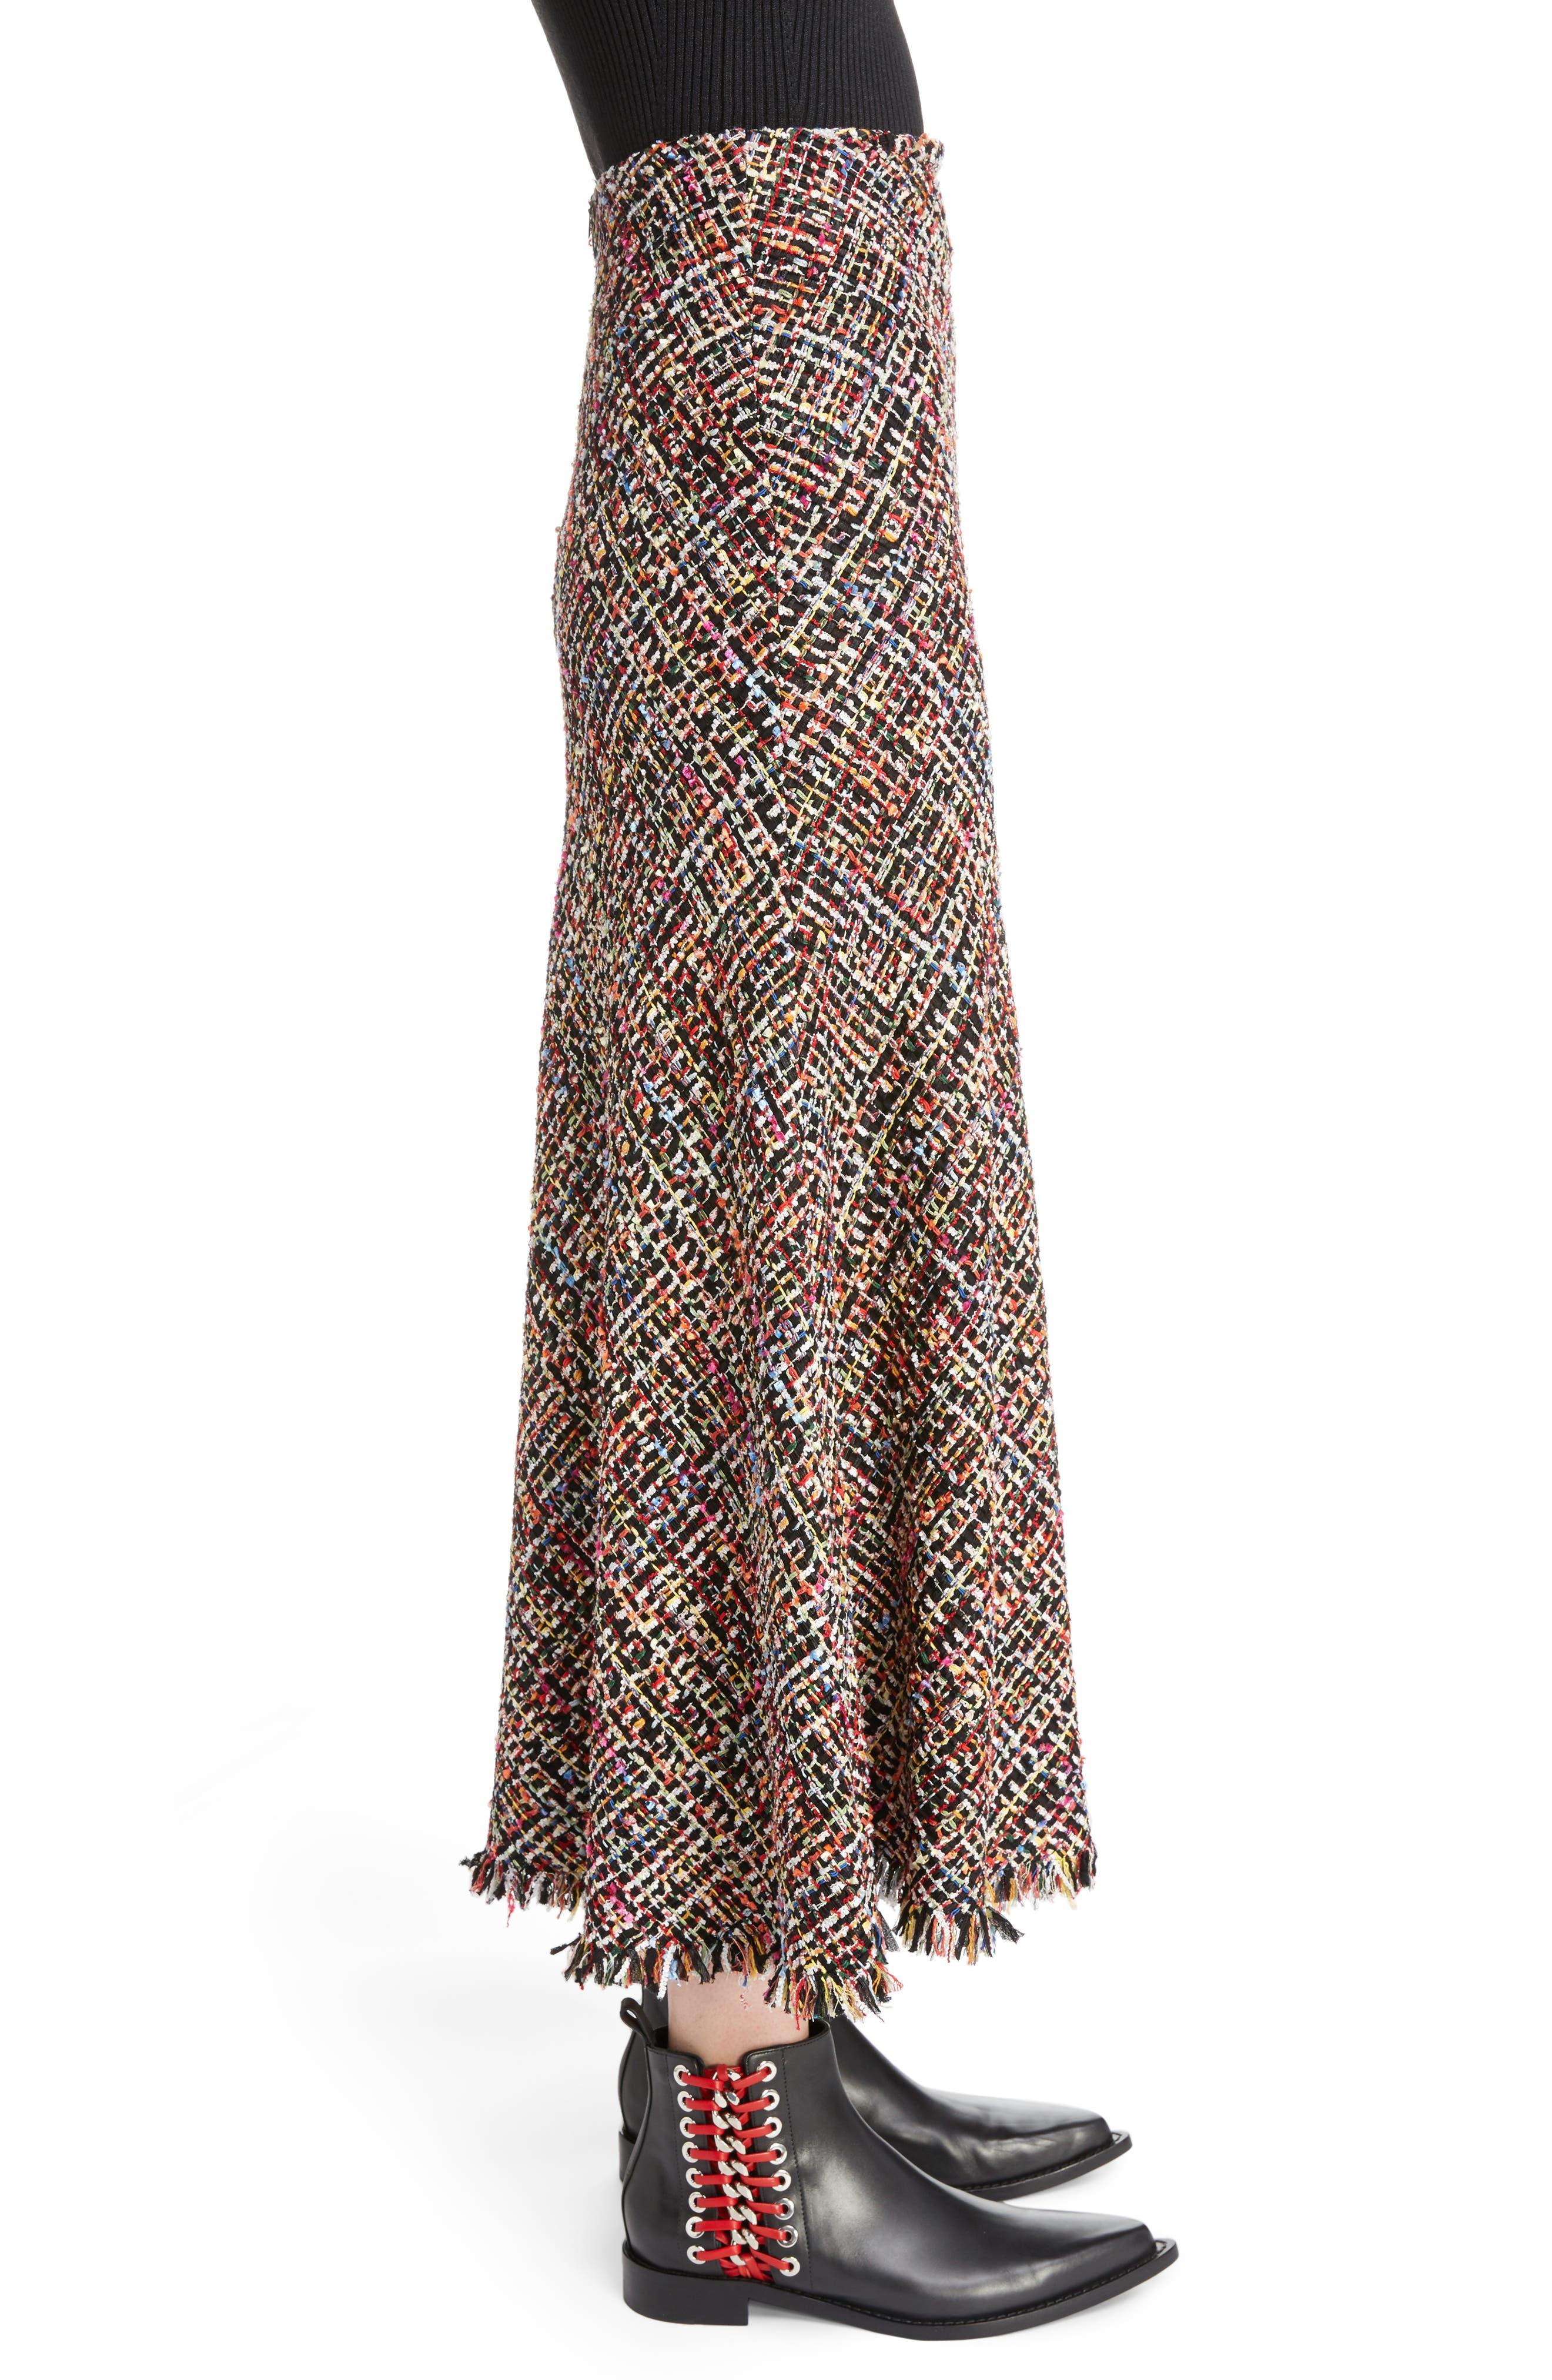 Wishing Tree Tweed Skirt,                             Alternate thumbnail 3, color,                             Black Mix